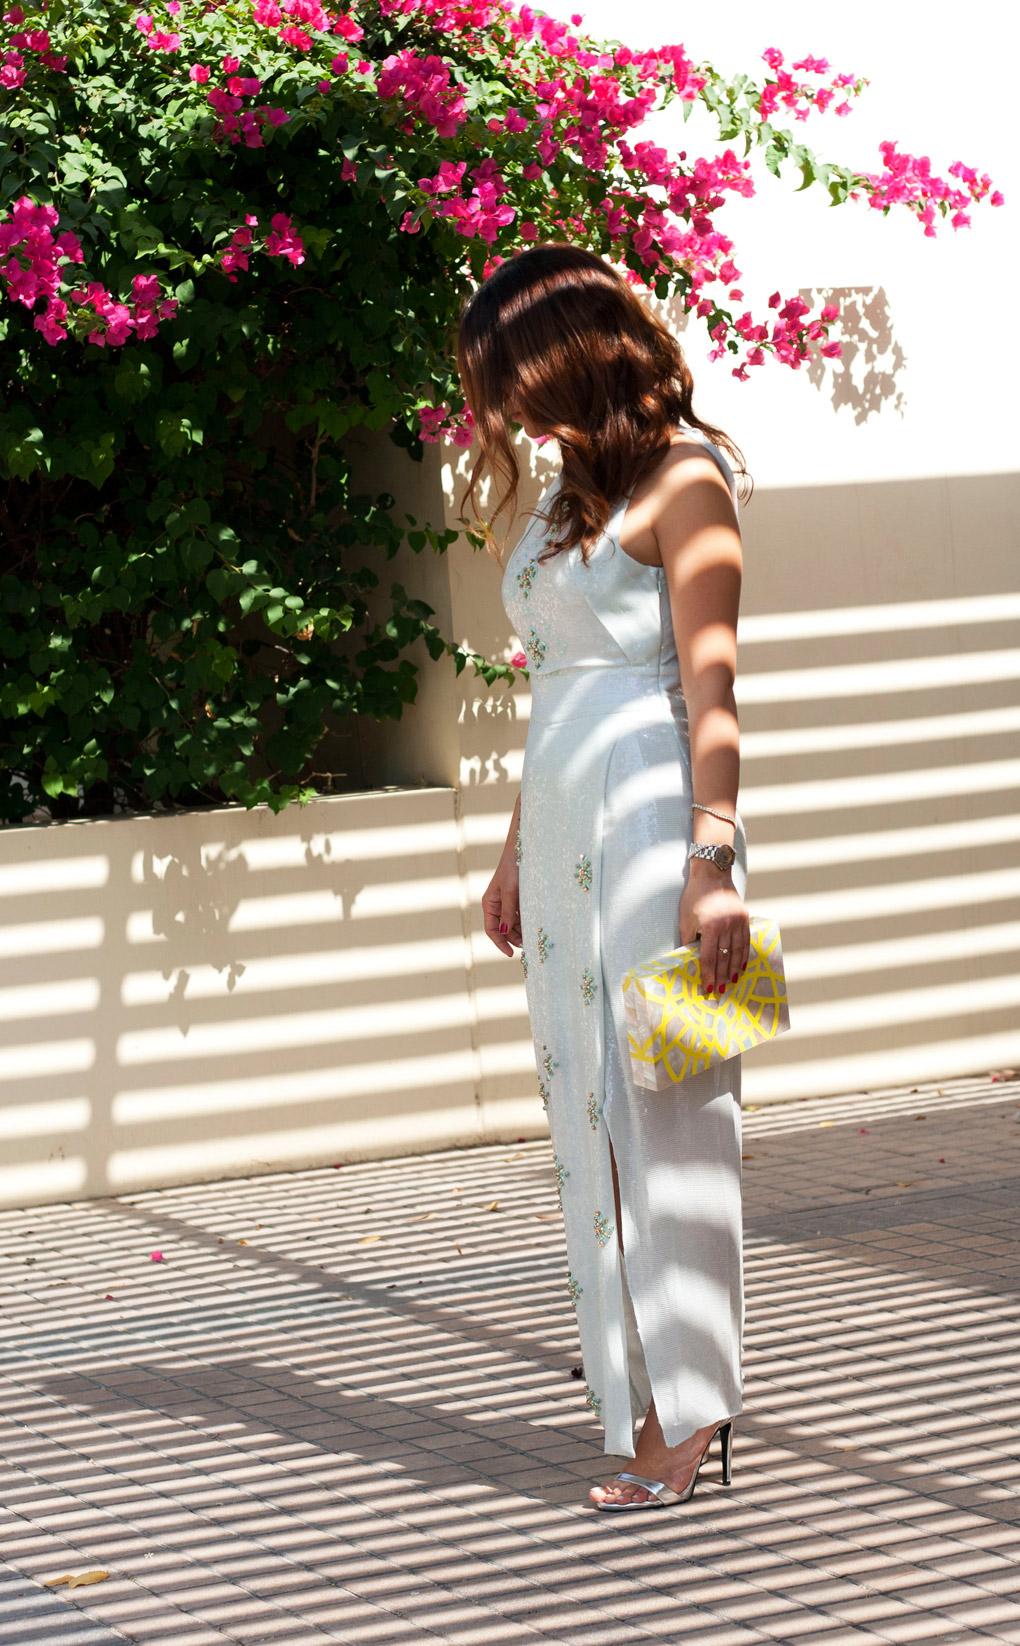 Lyla_Loves_Fashion_Toujouri_Dress_Nathalie_Trad_Clutch_Wedding_9238